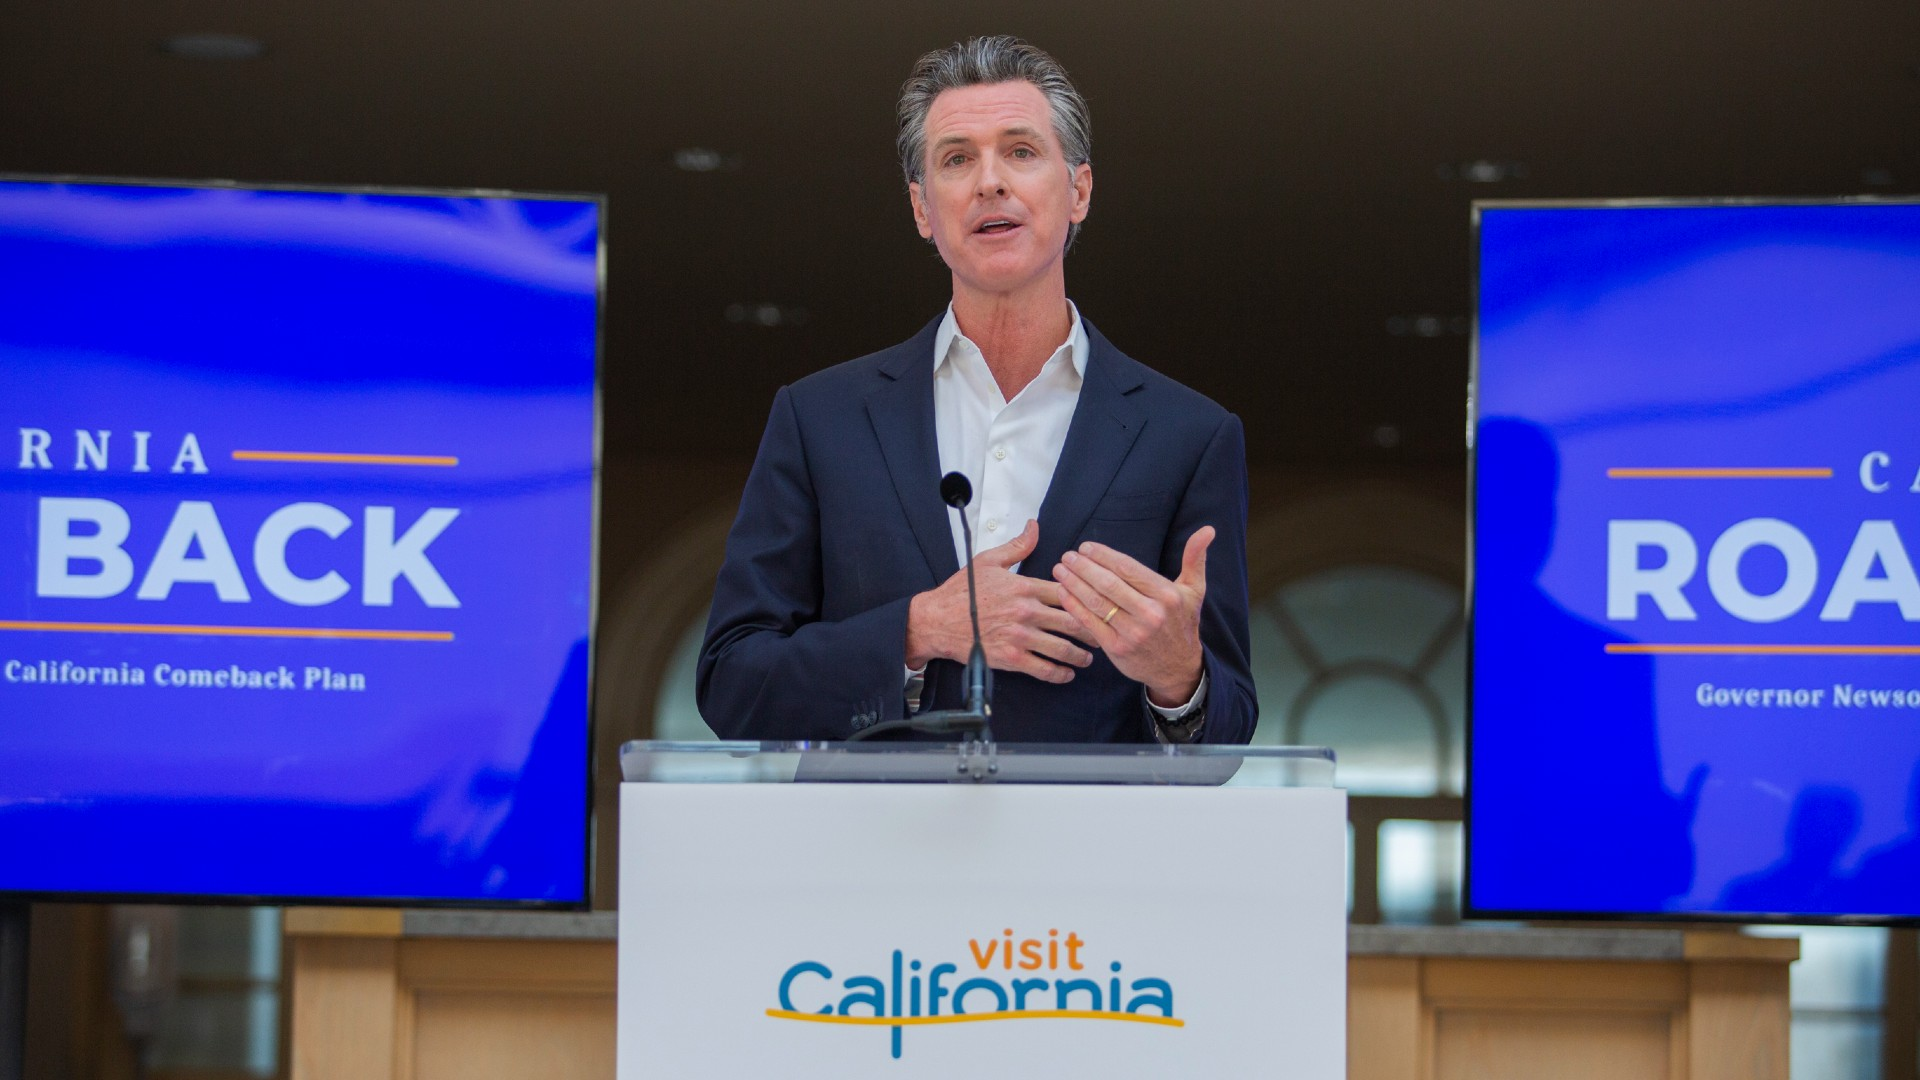 California Gov. Gavin Newsom speaks during a press conference in San Francisco on Monday, June 14, 2021. (Nina Riggio/San Francisco Chronicle via AP)